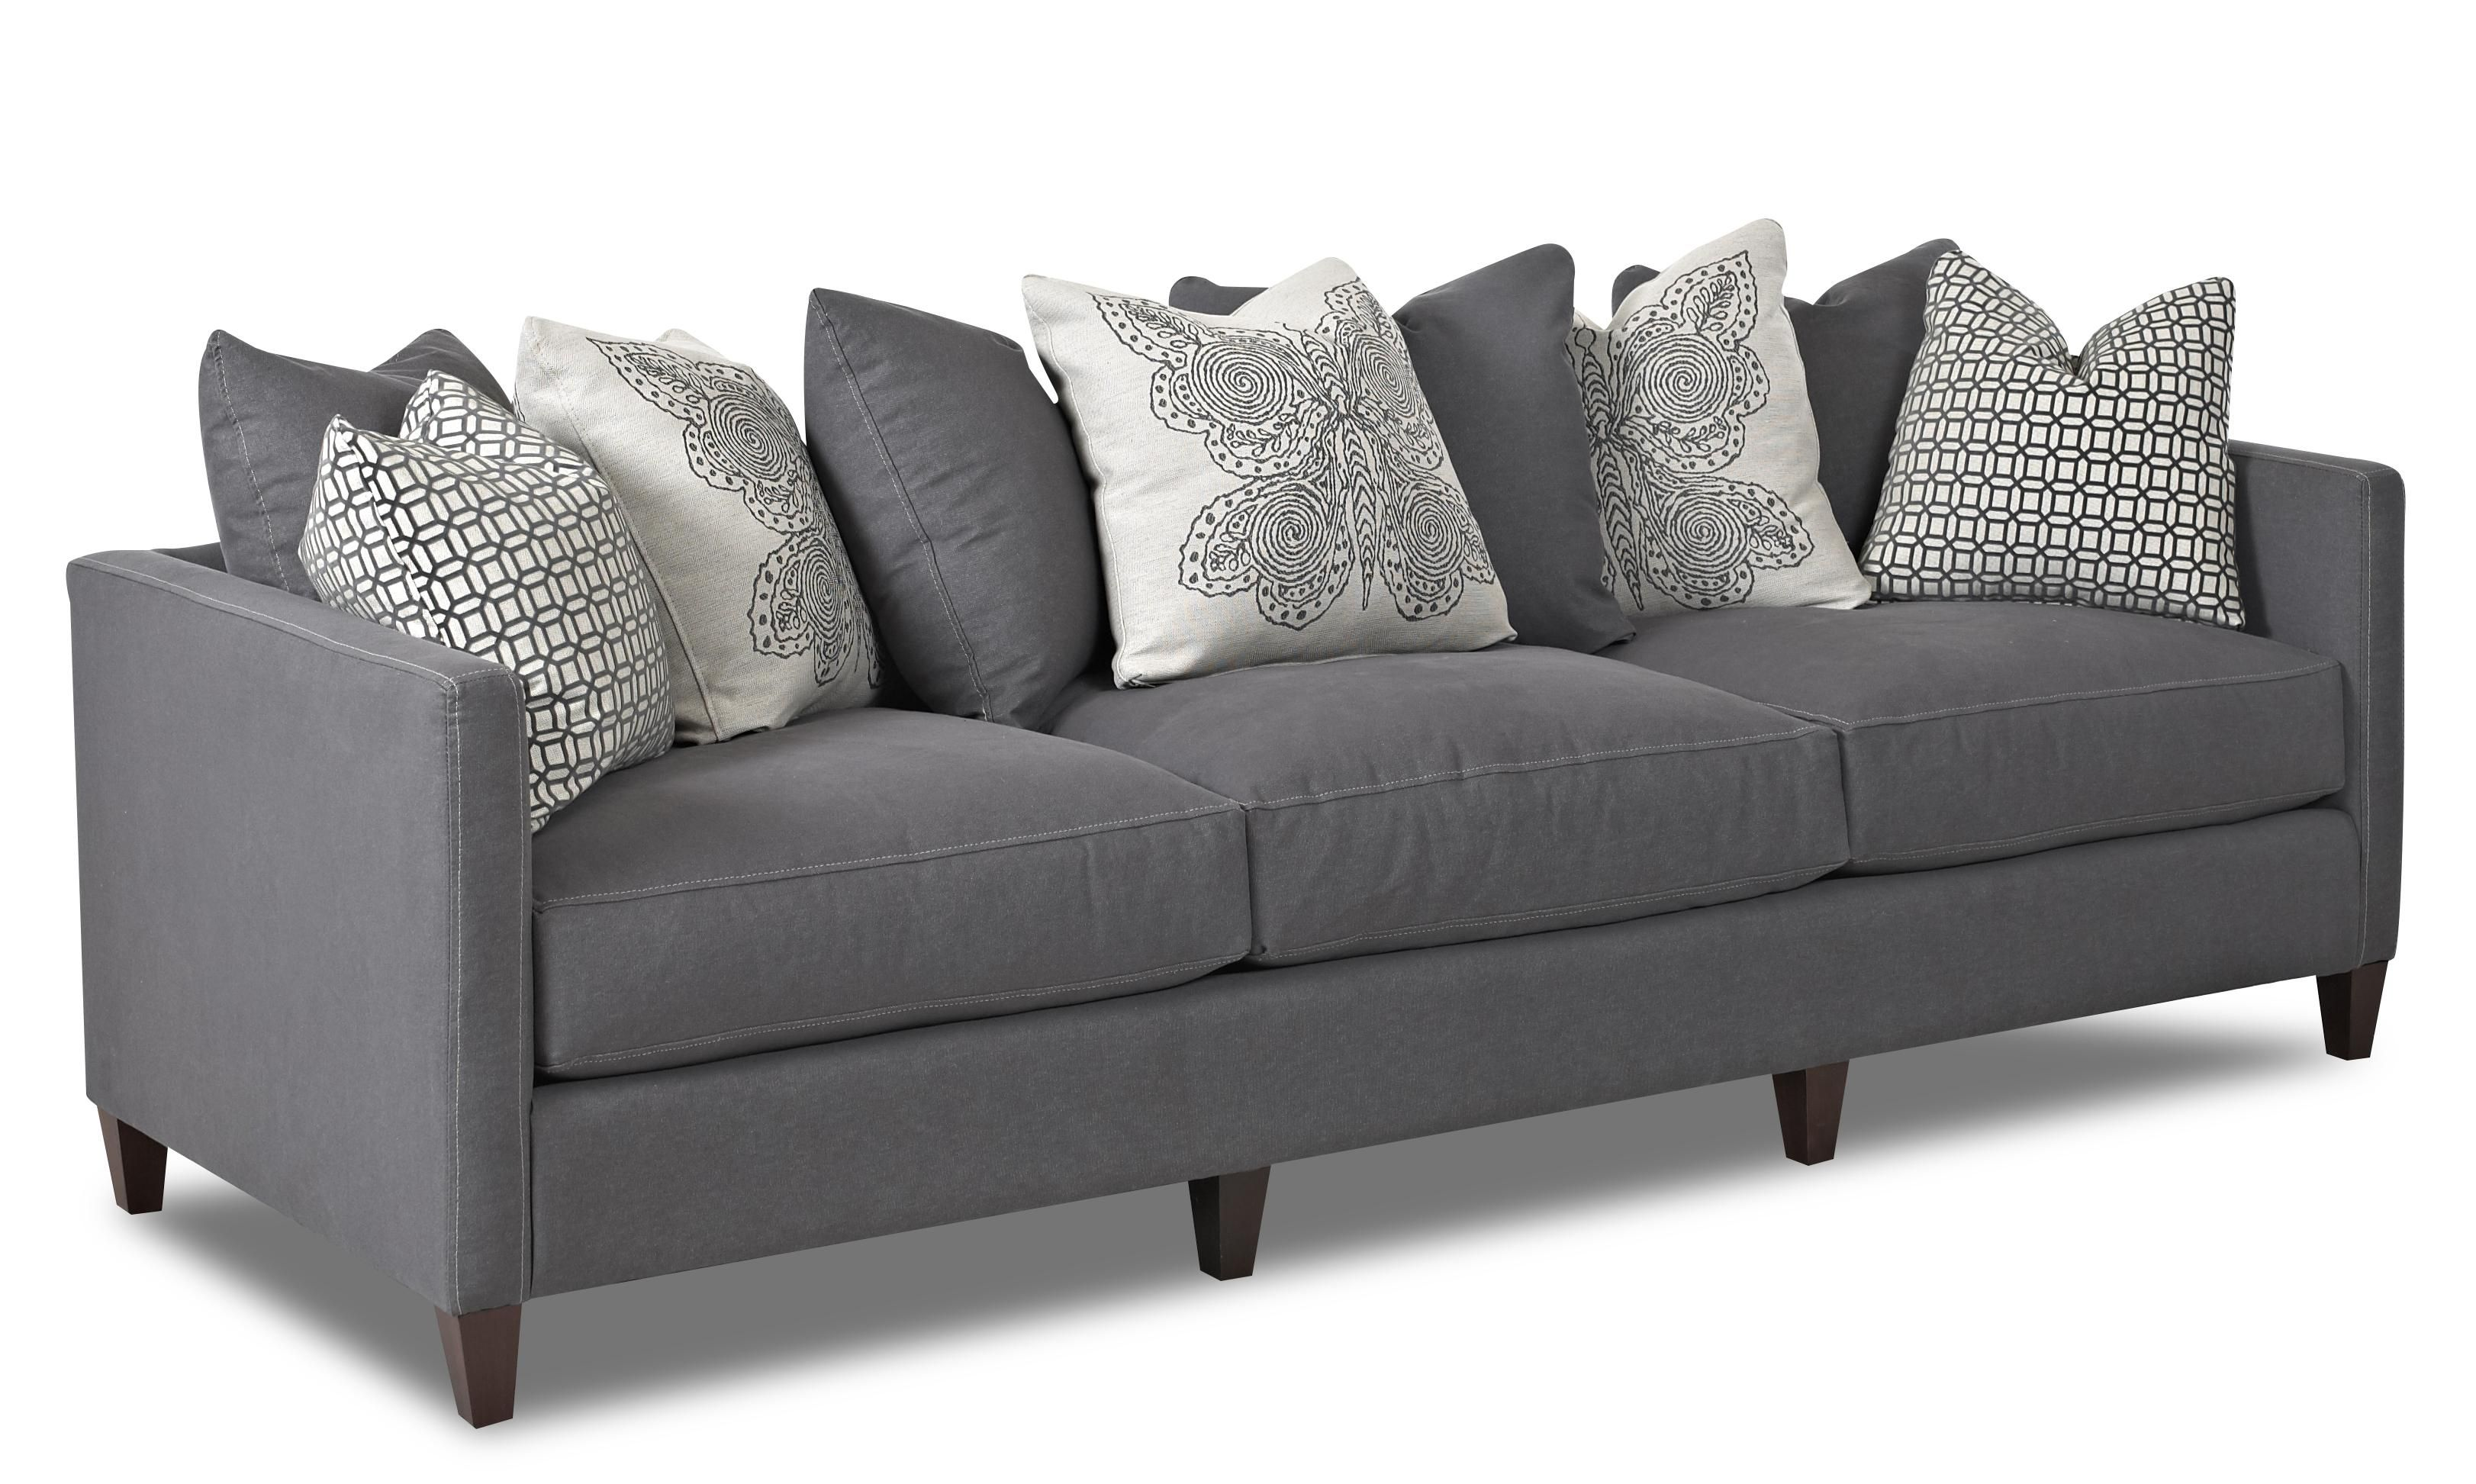 mattress rcwilley view firm s jsp store furniture willey rc luxury mattresses jordan traymoor queen serta